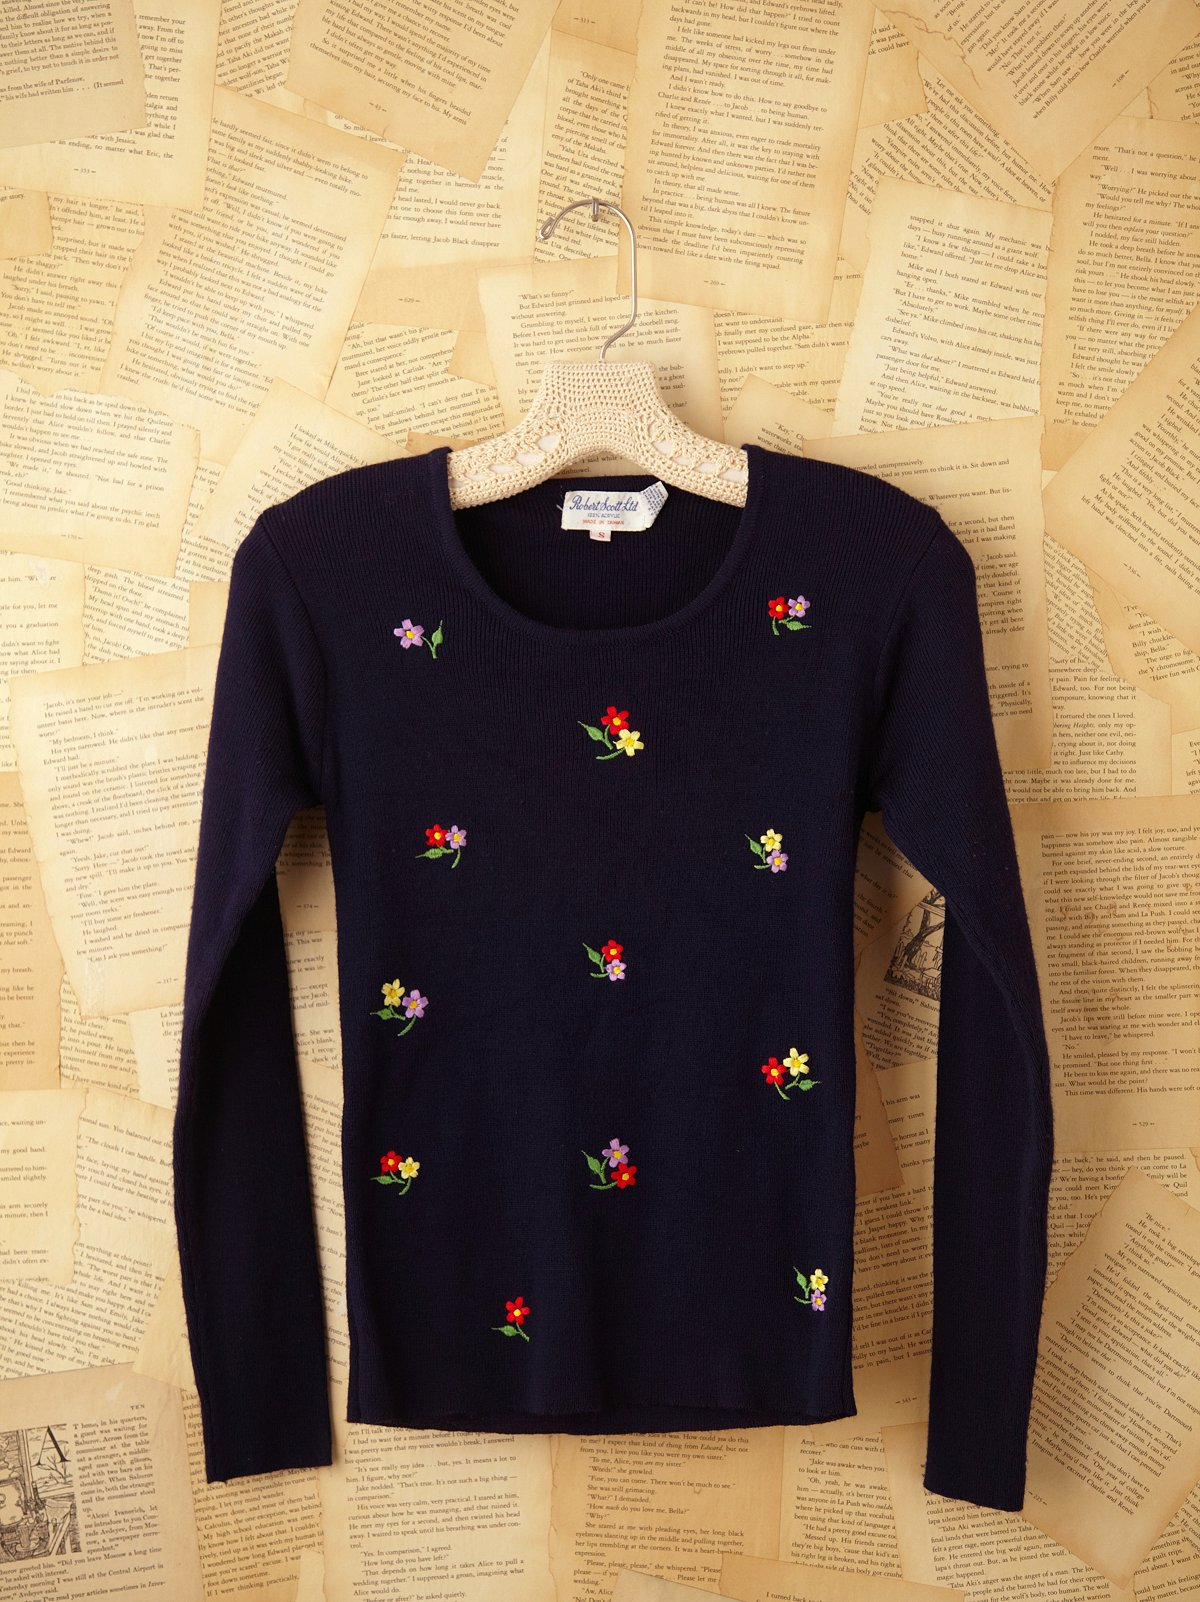 Vintage Robert Scott Sweater